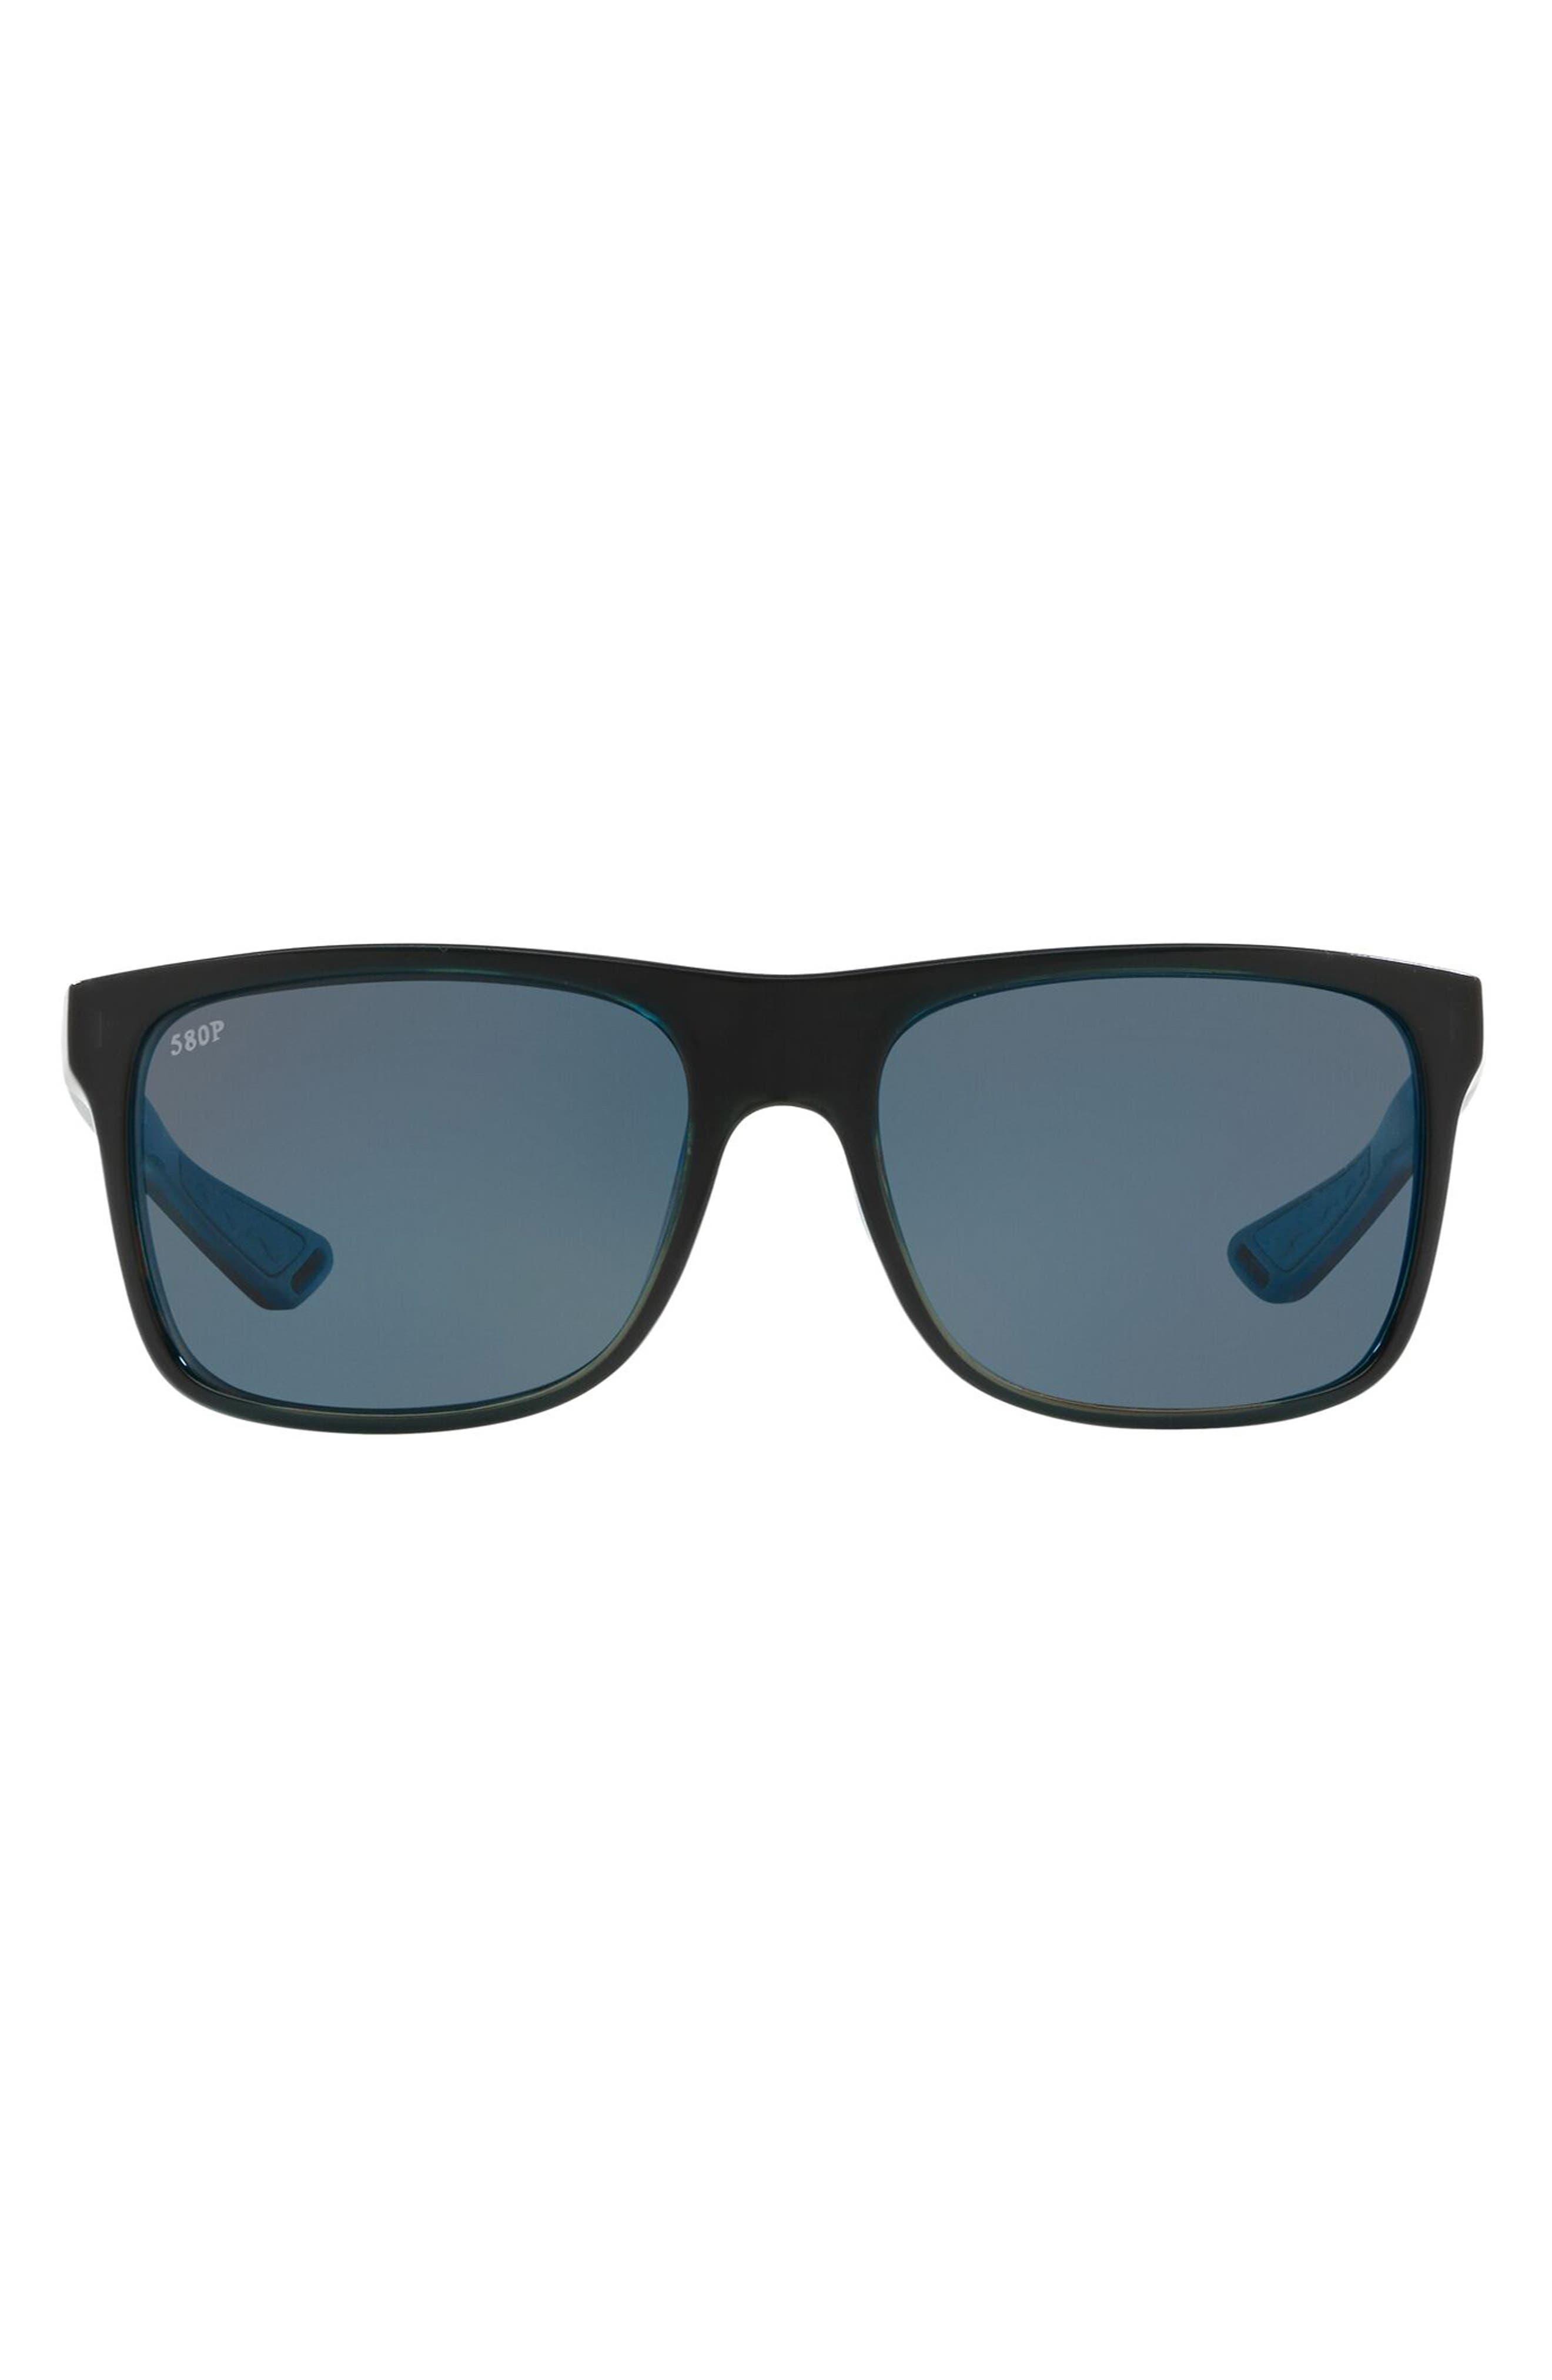 56mm Polarized Square Sunglasses